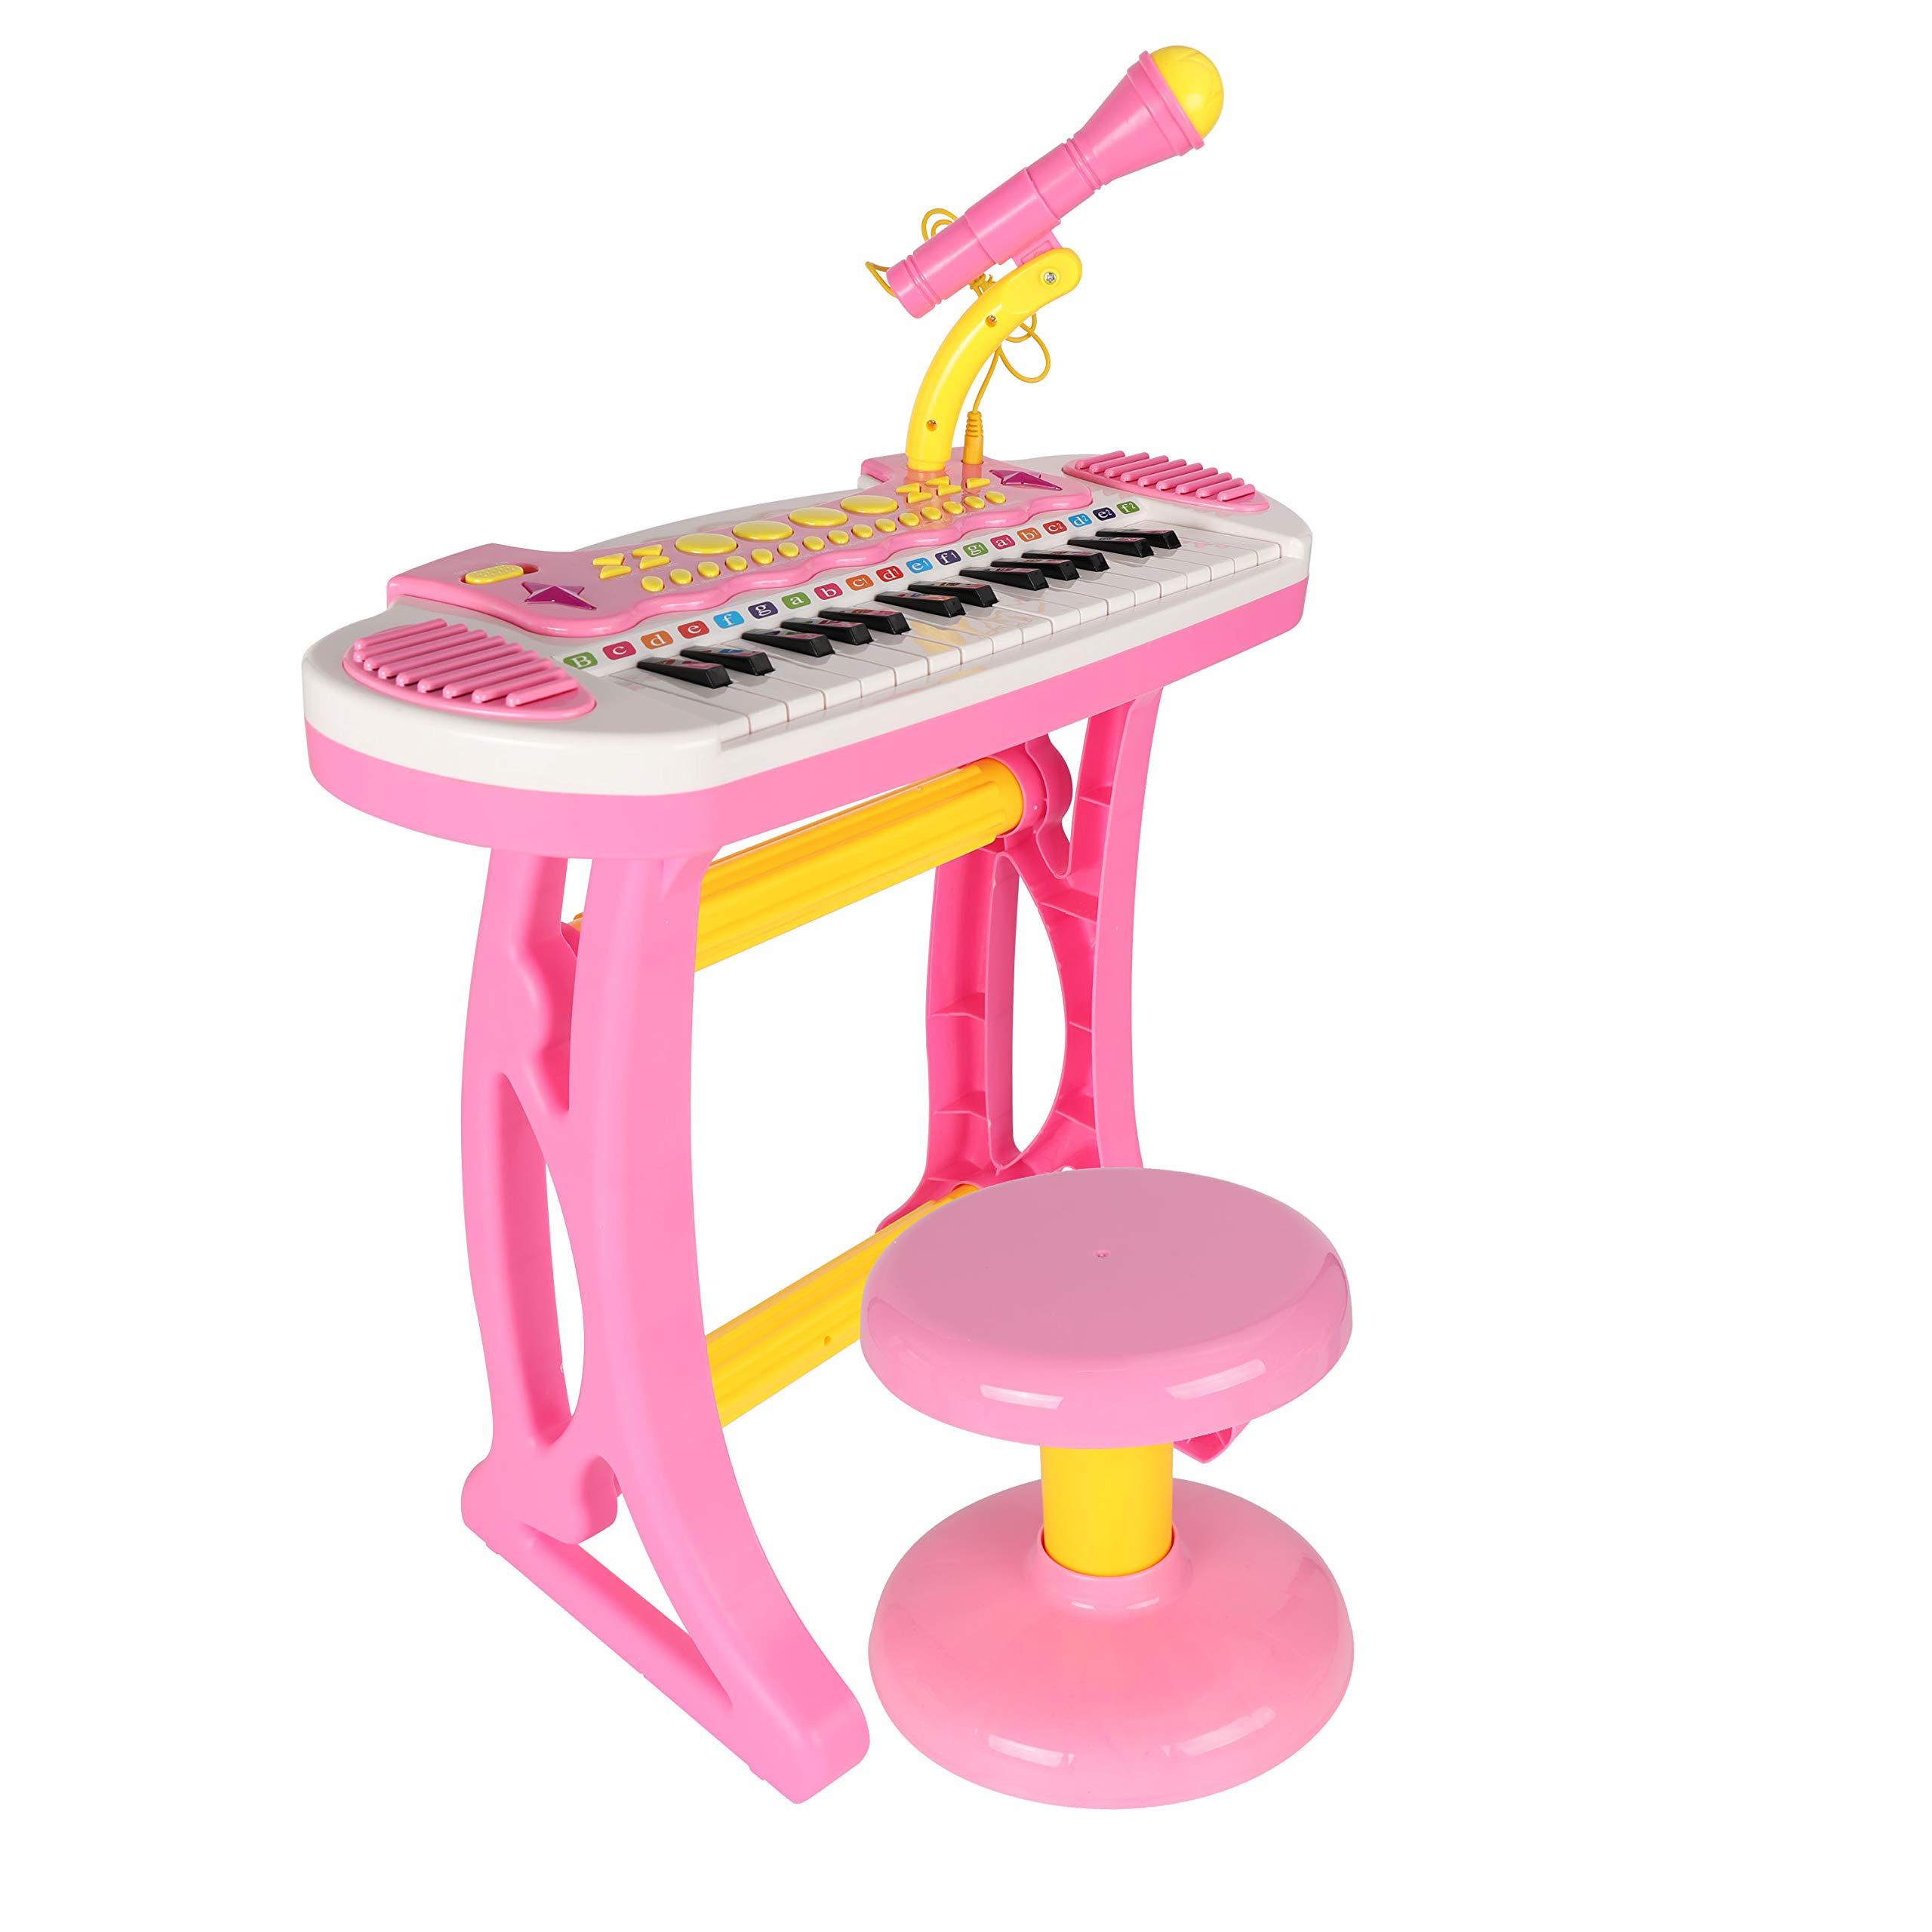 BAOLI 31 Keys Pink Children Musical Toys Electronic Organ Keyboard Piano with Karaoke Recording by BAOLI